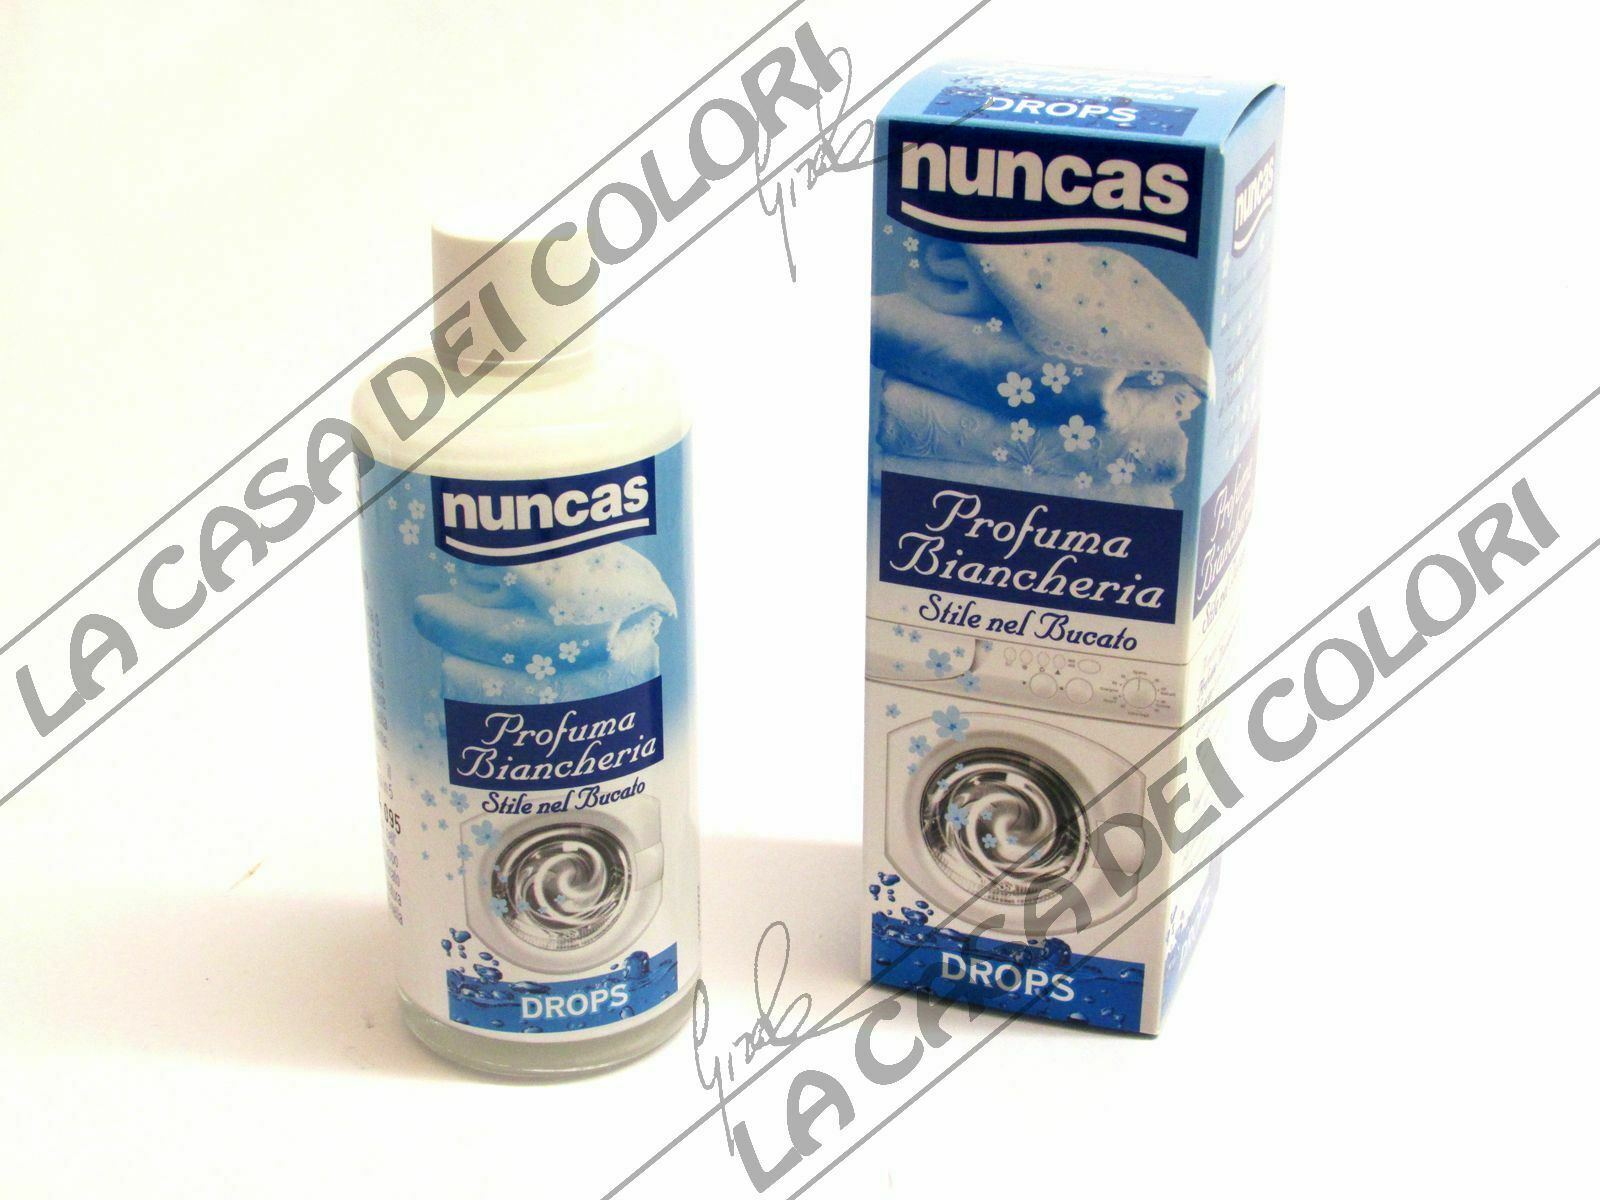 NUNCAS DROPS PROFUMA BIANCHERIA 100 ml CLASSIC PROFUMATORE PER BUCATO